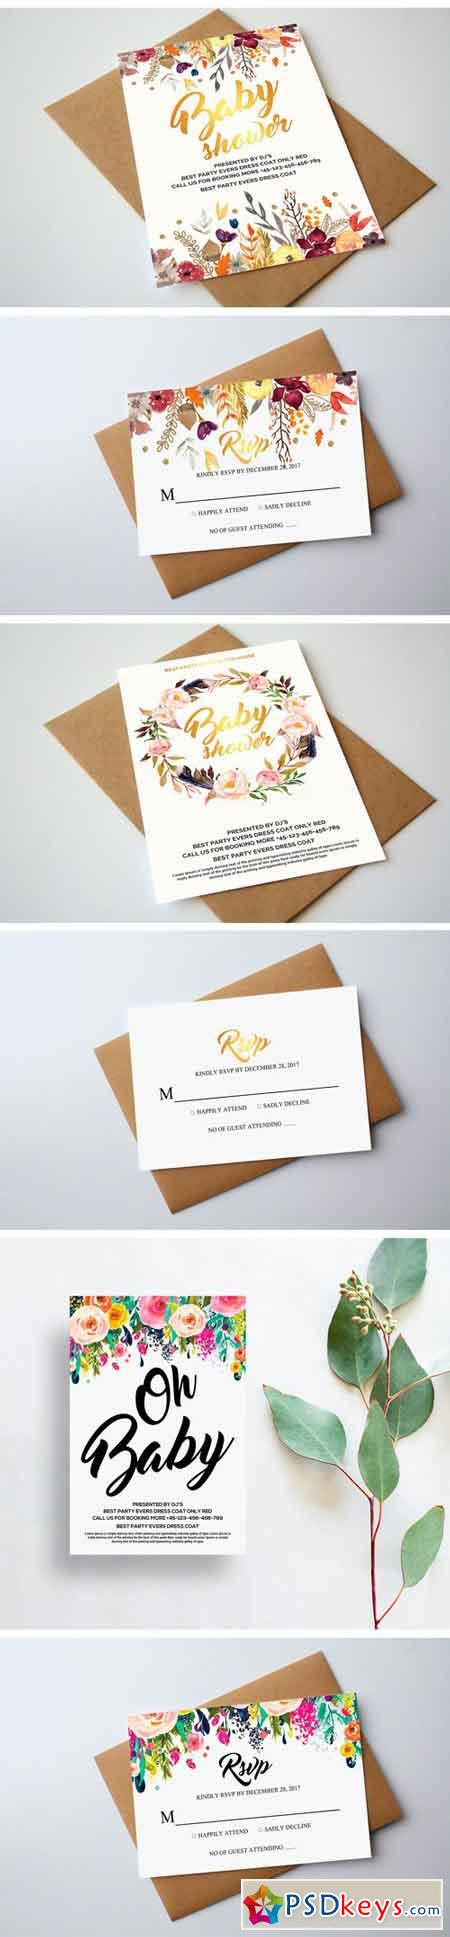 10 Invitation Cards Bundle  1320423